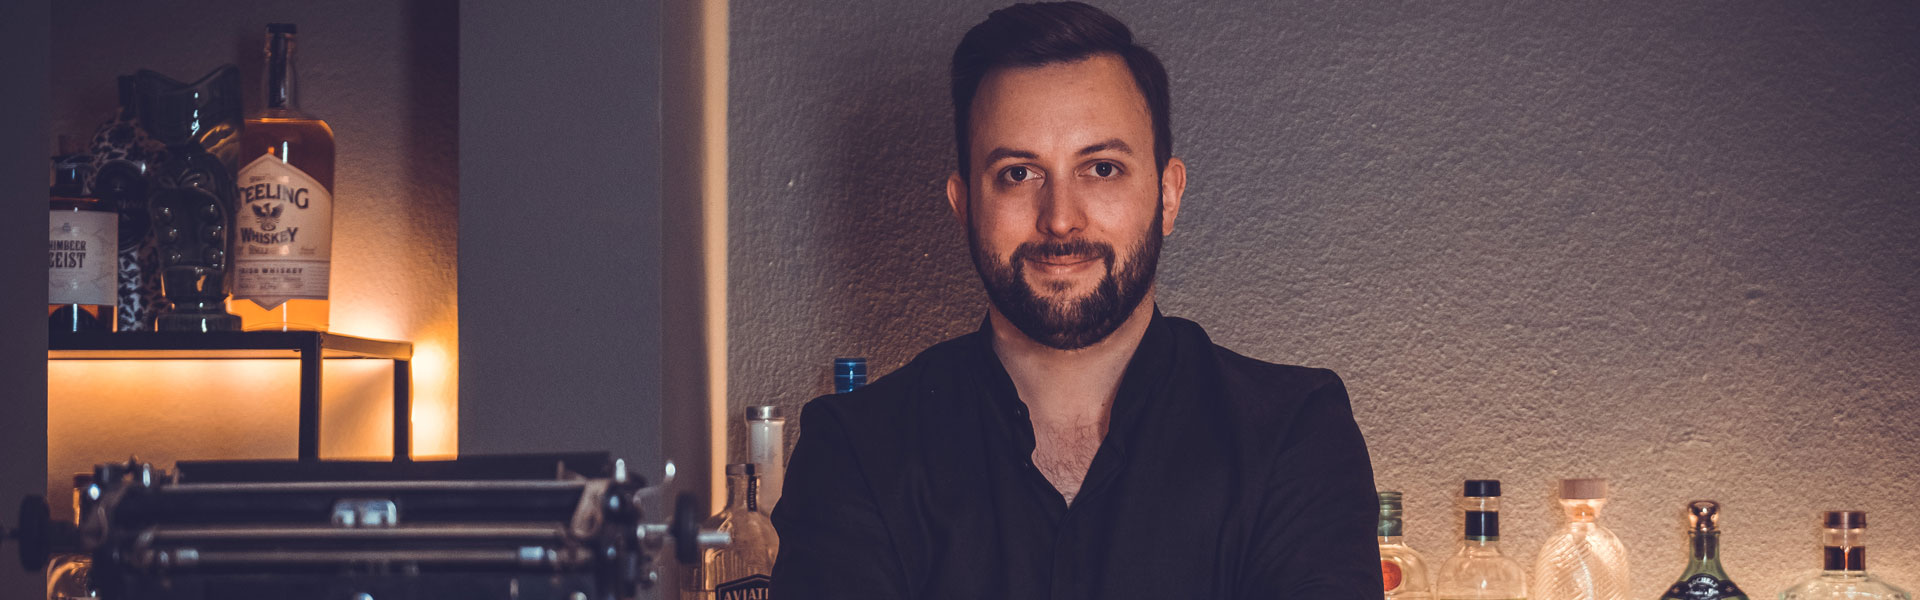 Daniel Fürg